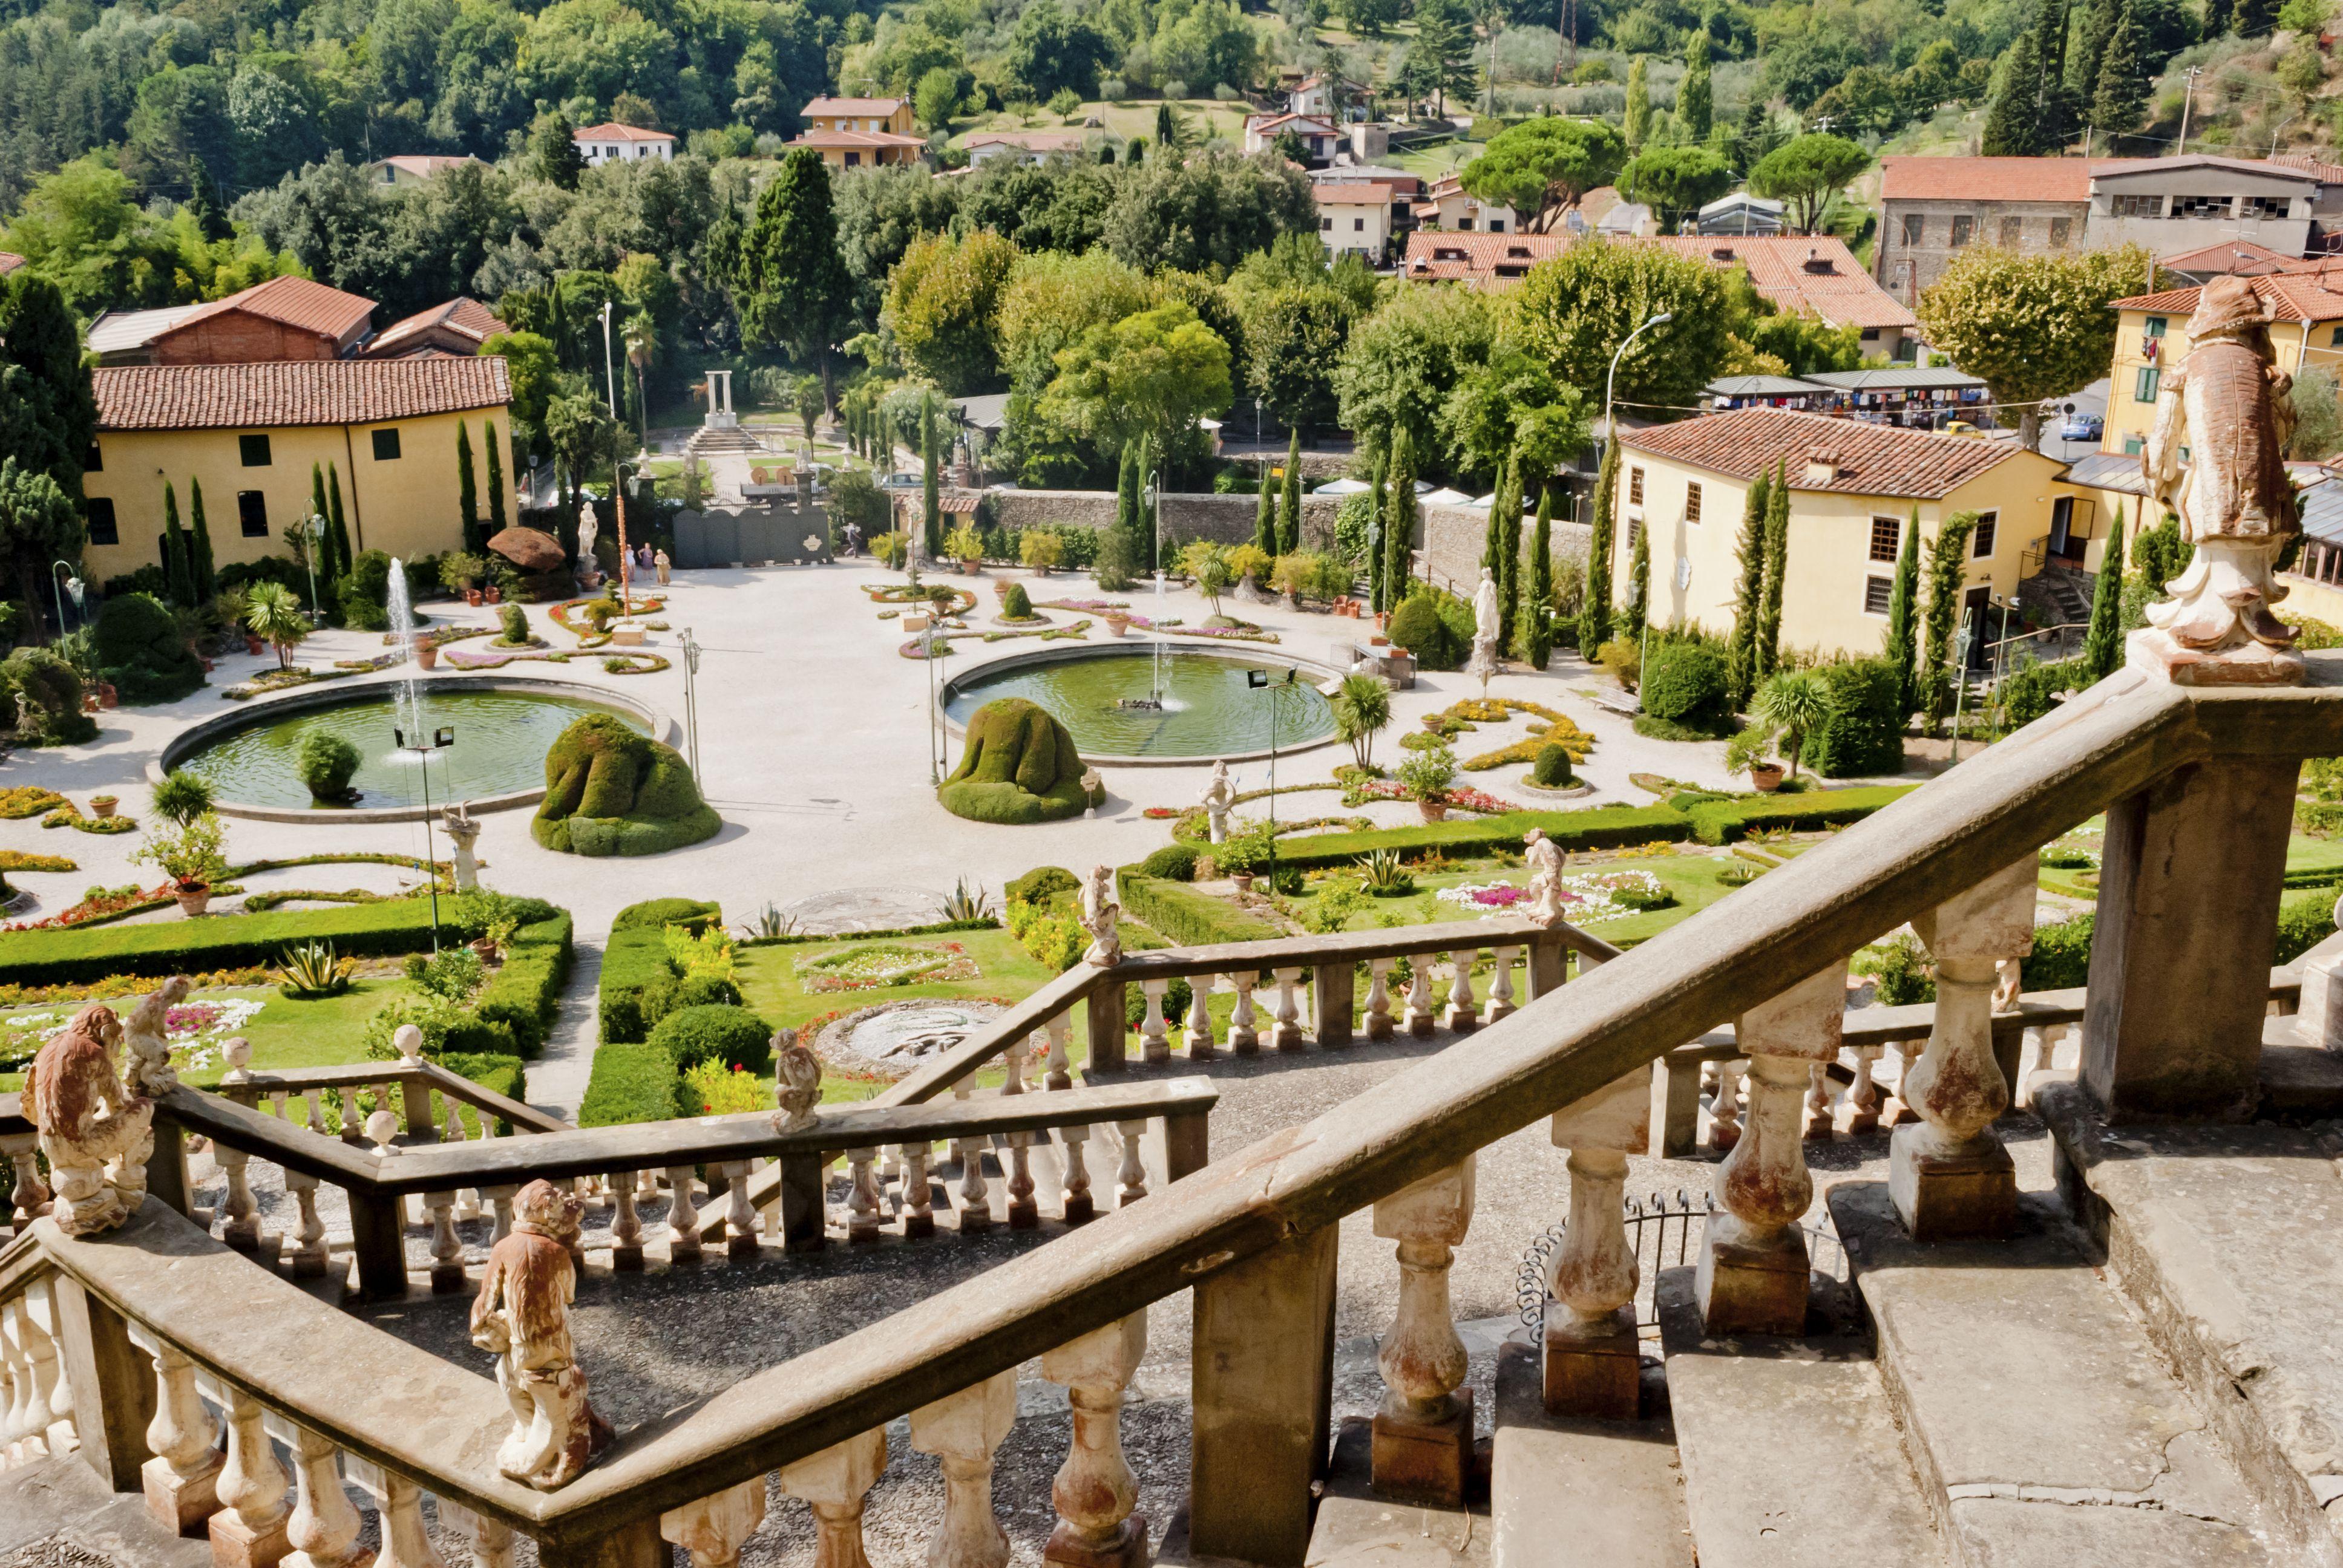 Der Garten der Villa Garzoni in Collodi / Toskana